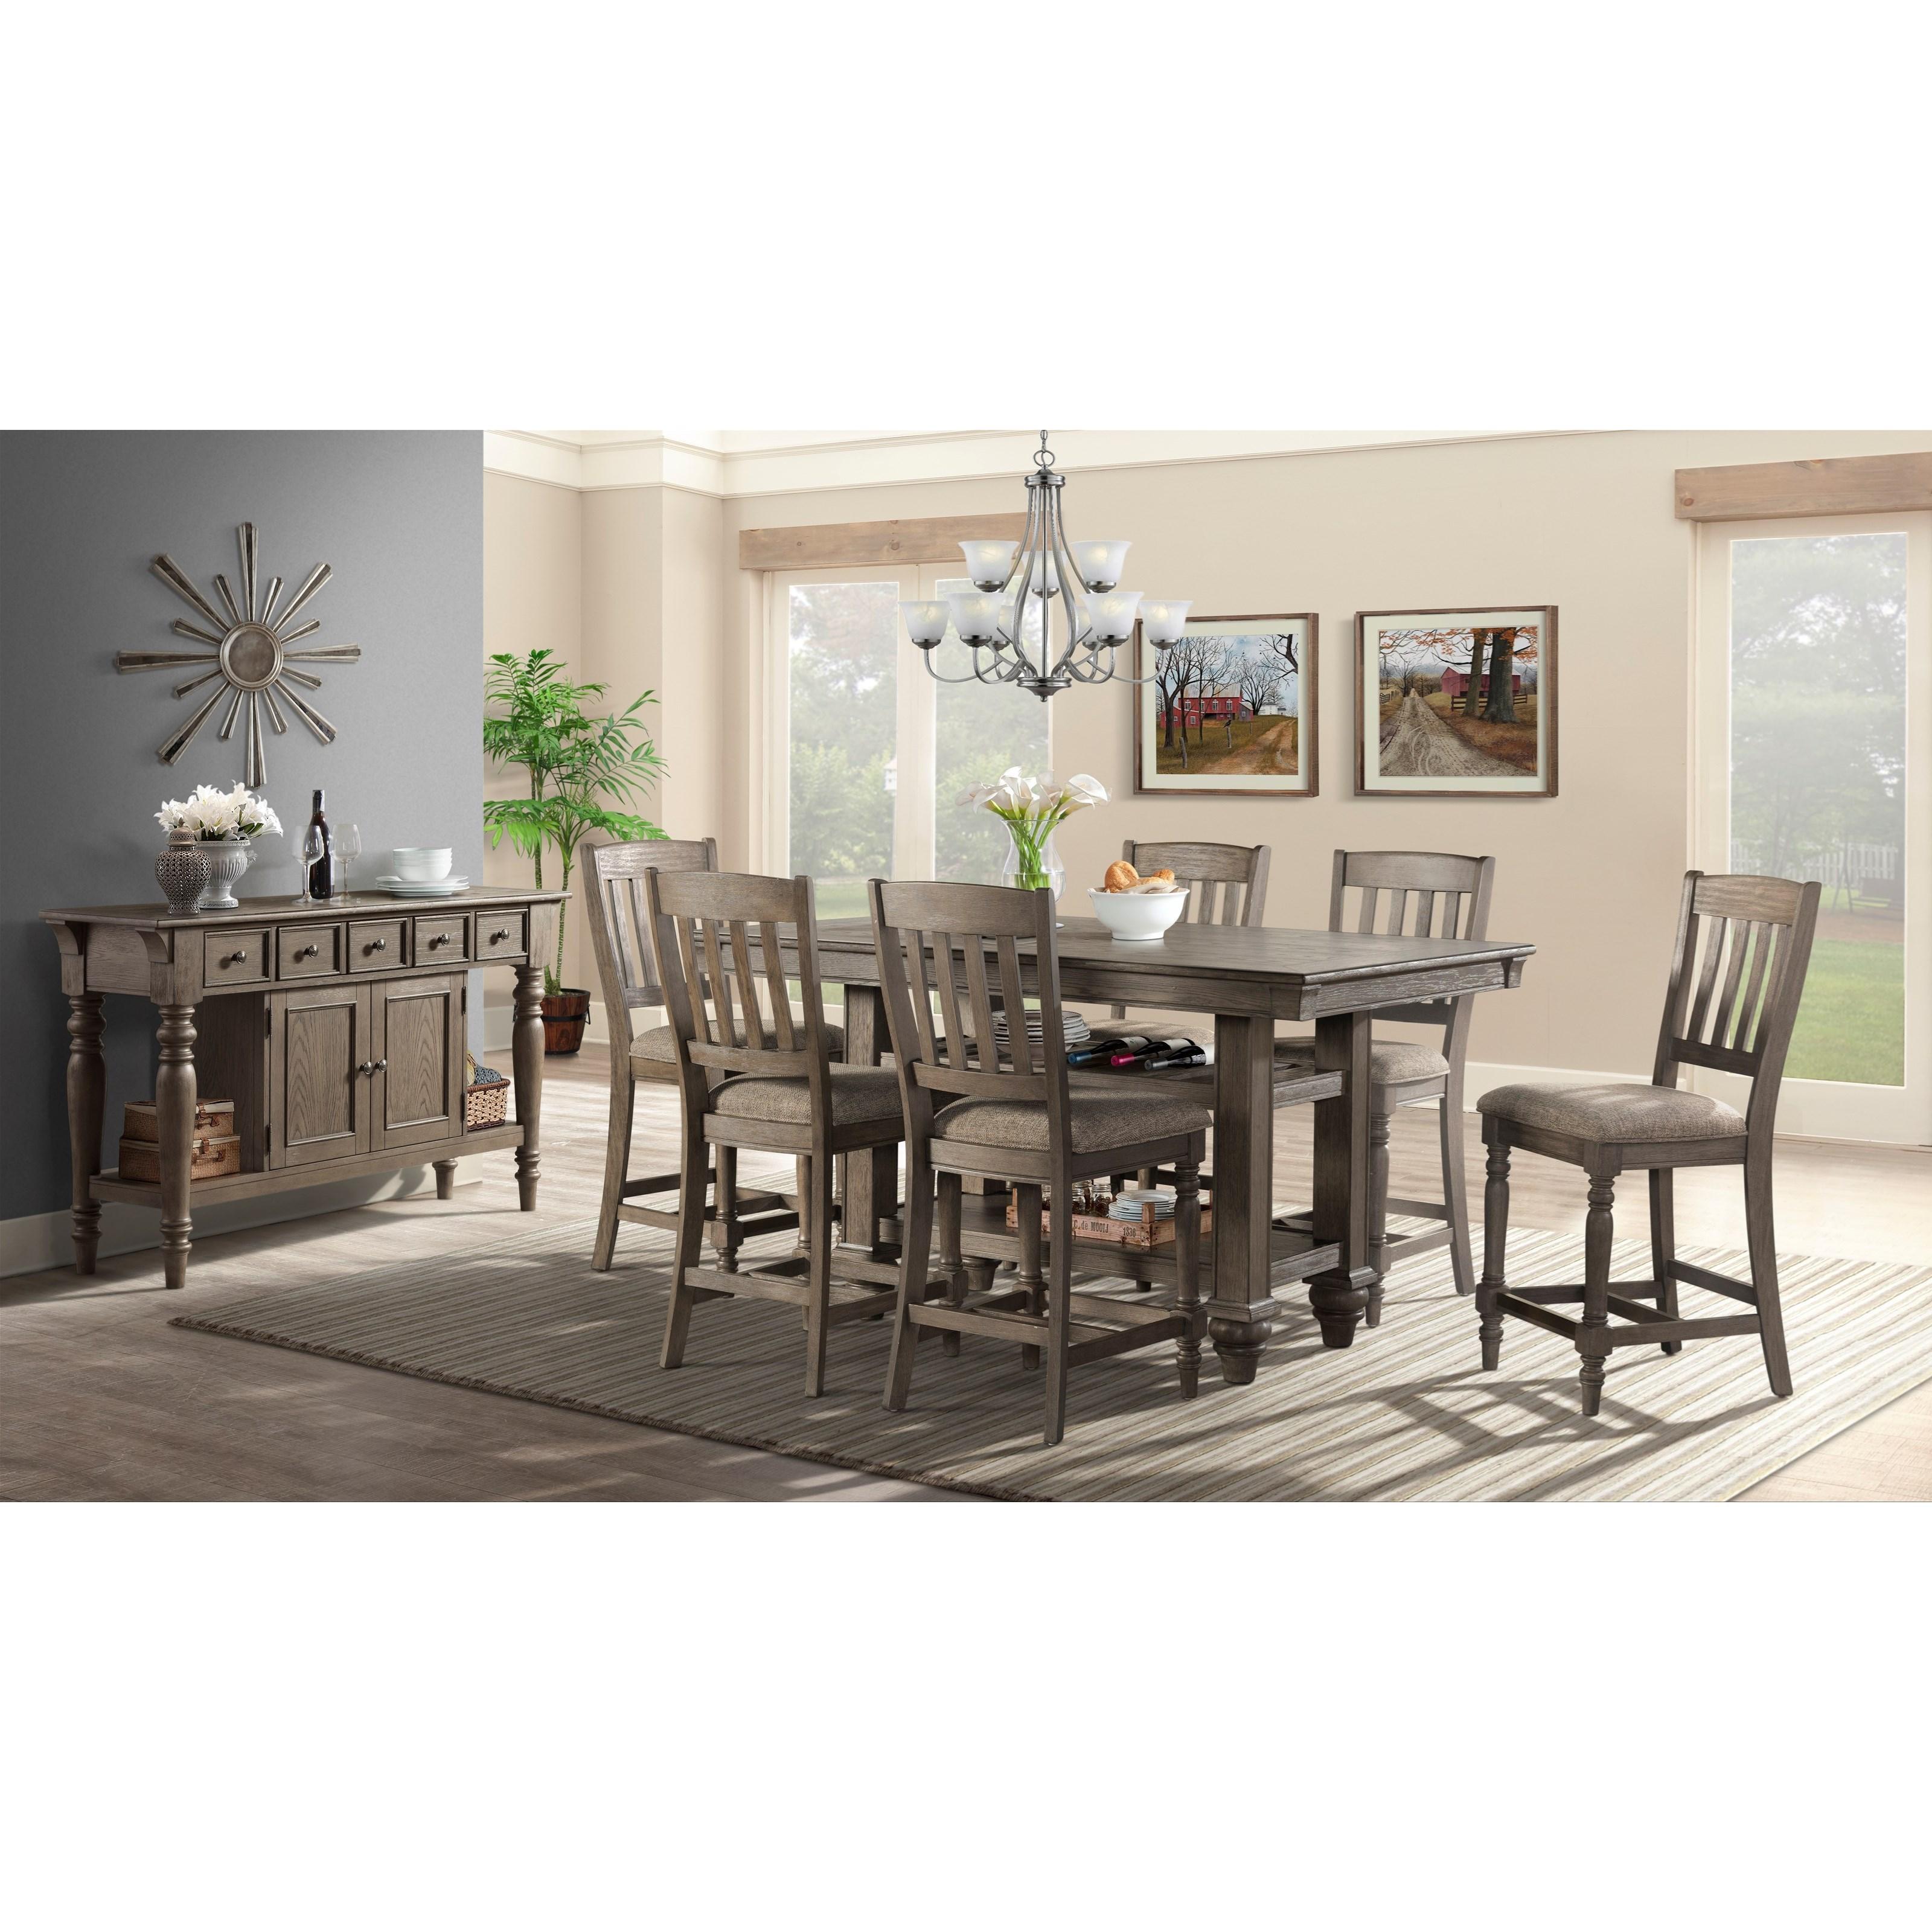 Balboa Park  Formal Dining Group by VFM Signature at Virginia Furniture Market